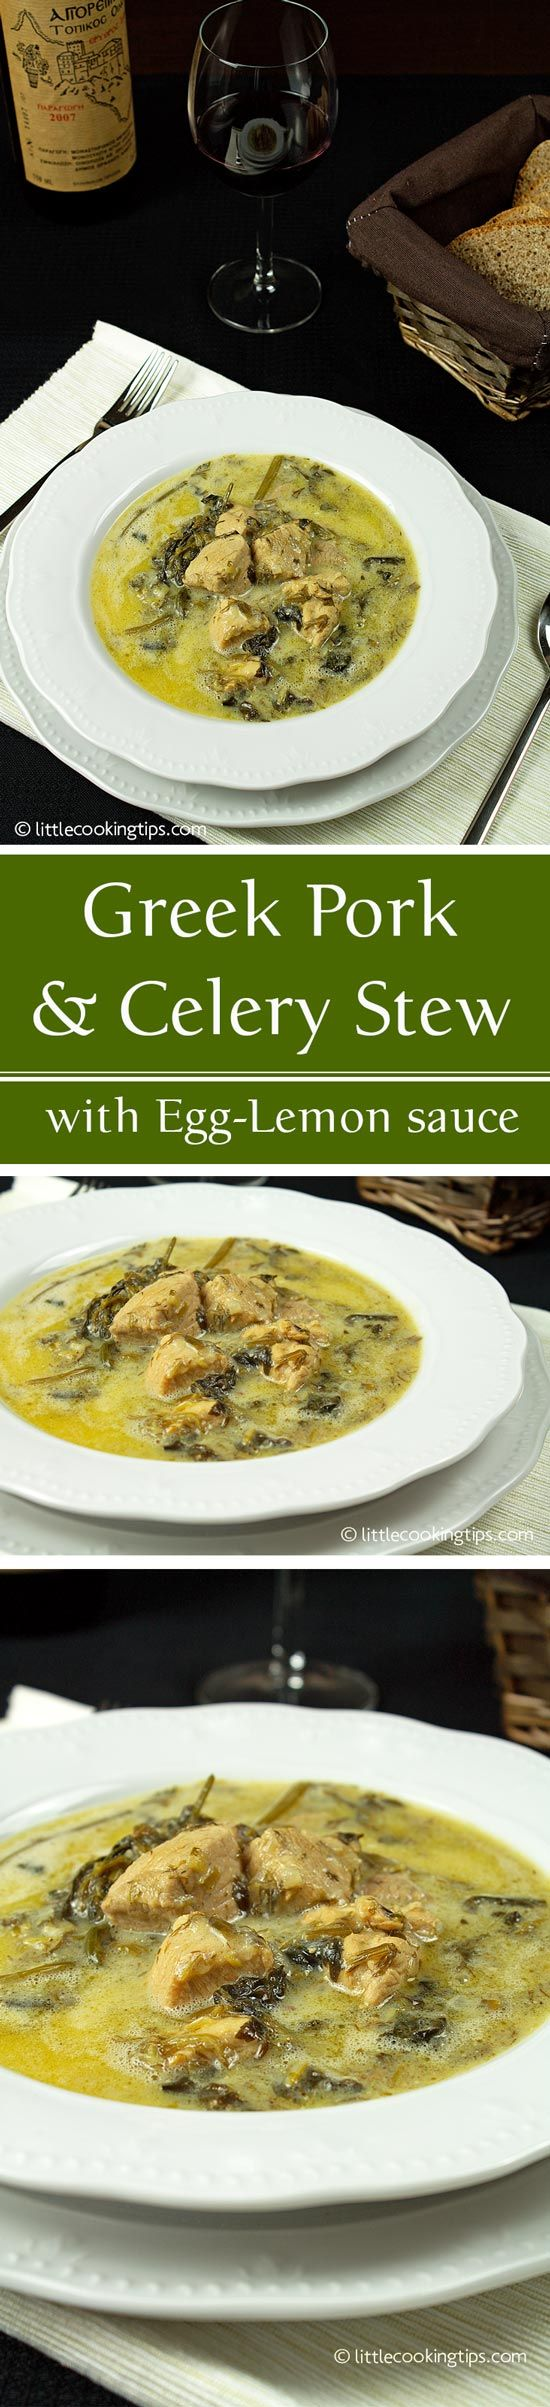 Greek Pork and Celery Stew (Hirino me Selino)